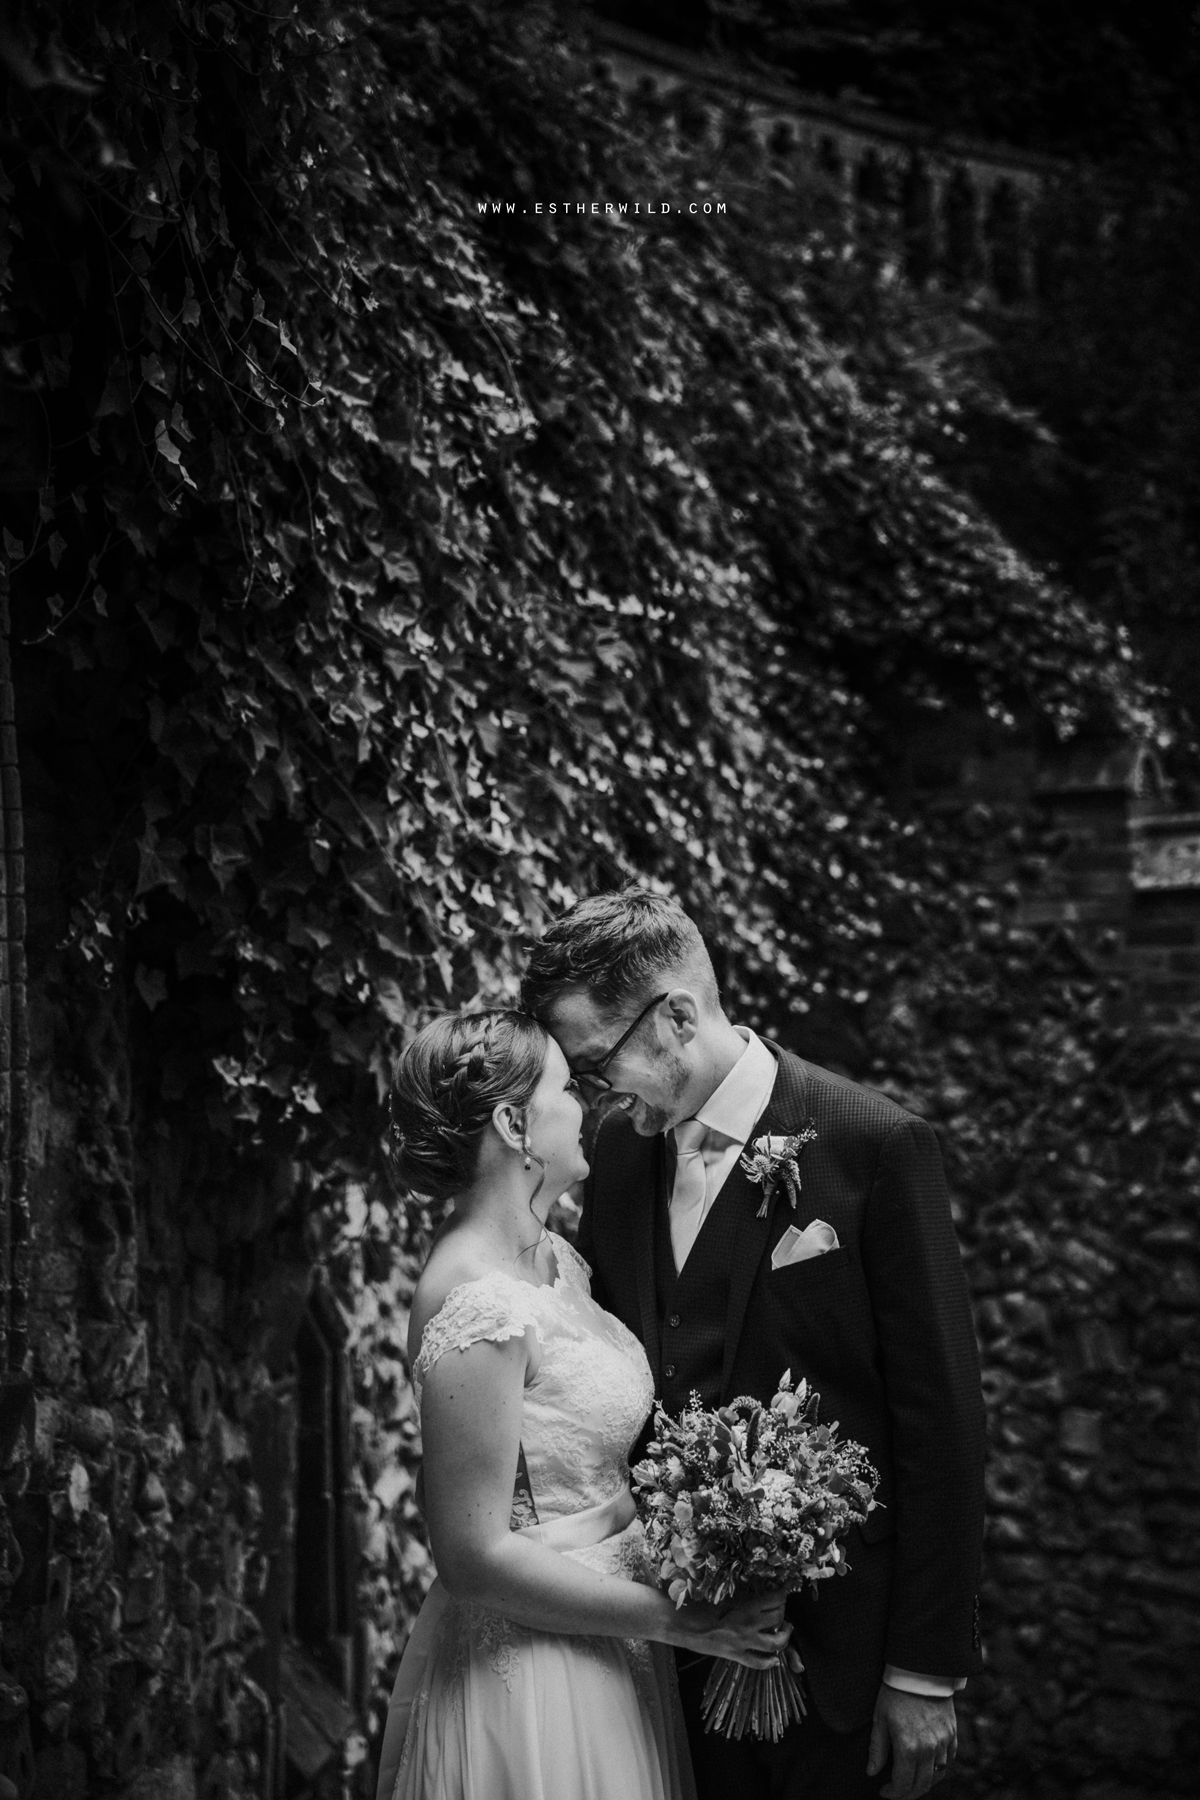 The_Georgian_Townhouse_Wedding_Norwich_Esther_Wild_Photographer_3R8A1727-2.jpg